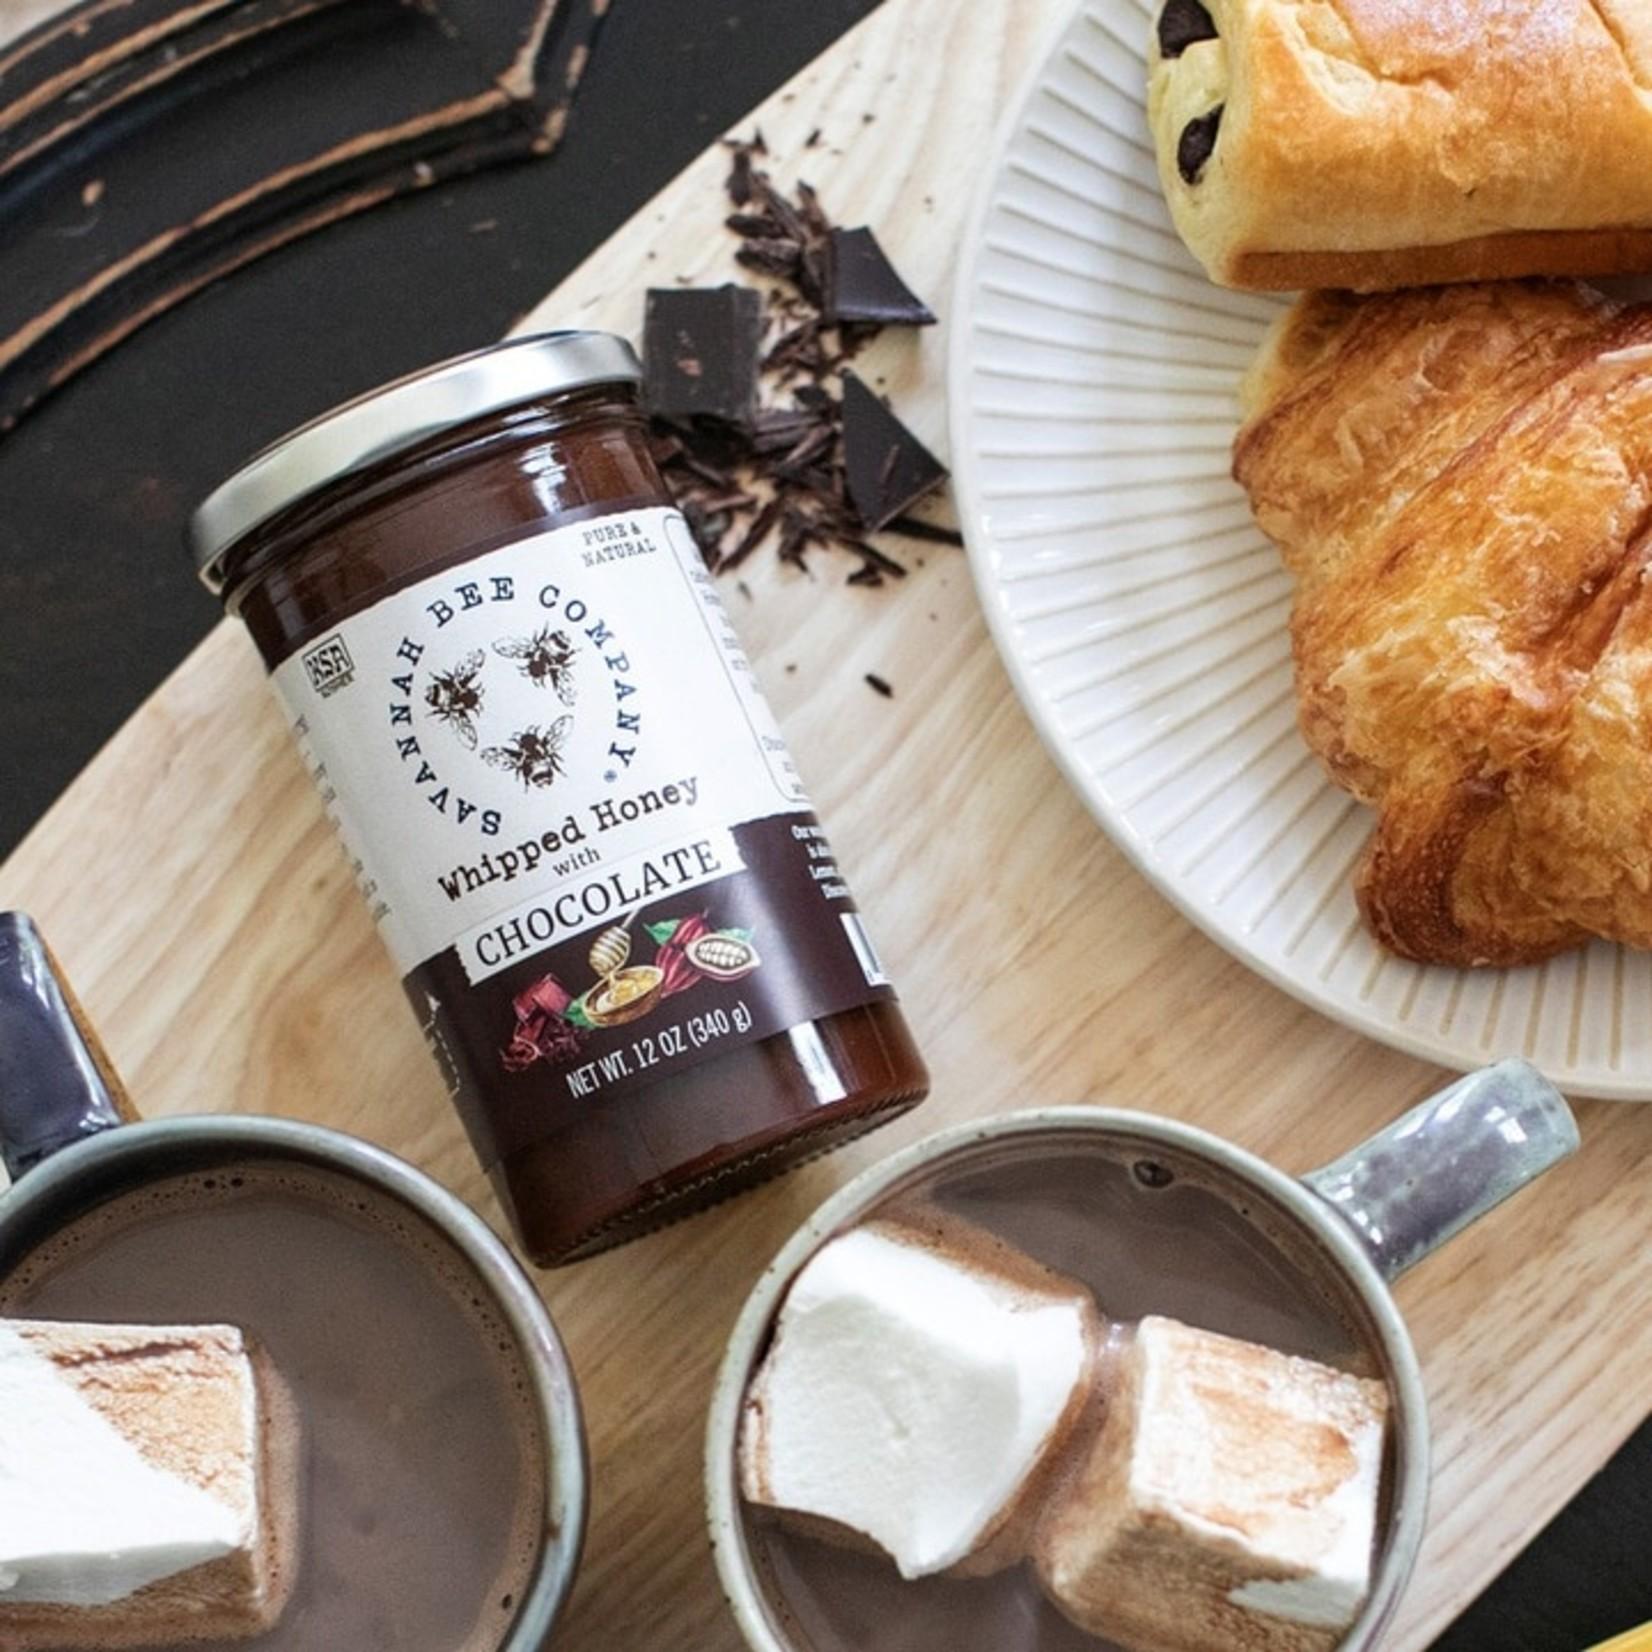 Savannah Bee Company Whipped Honey with Chocolate